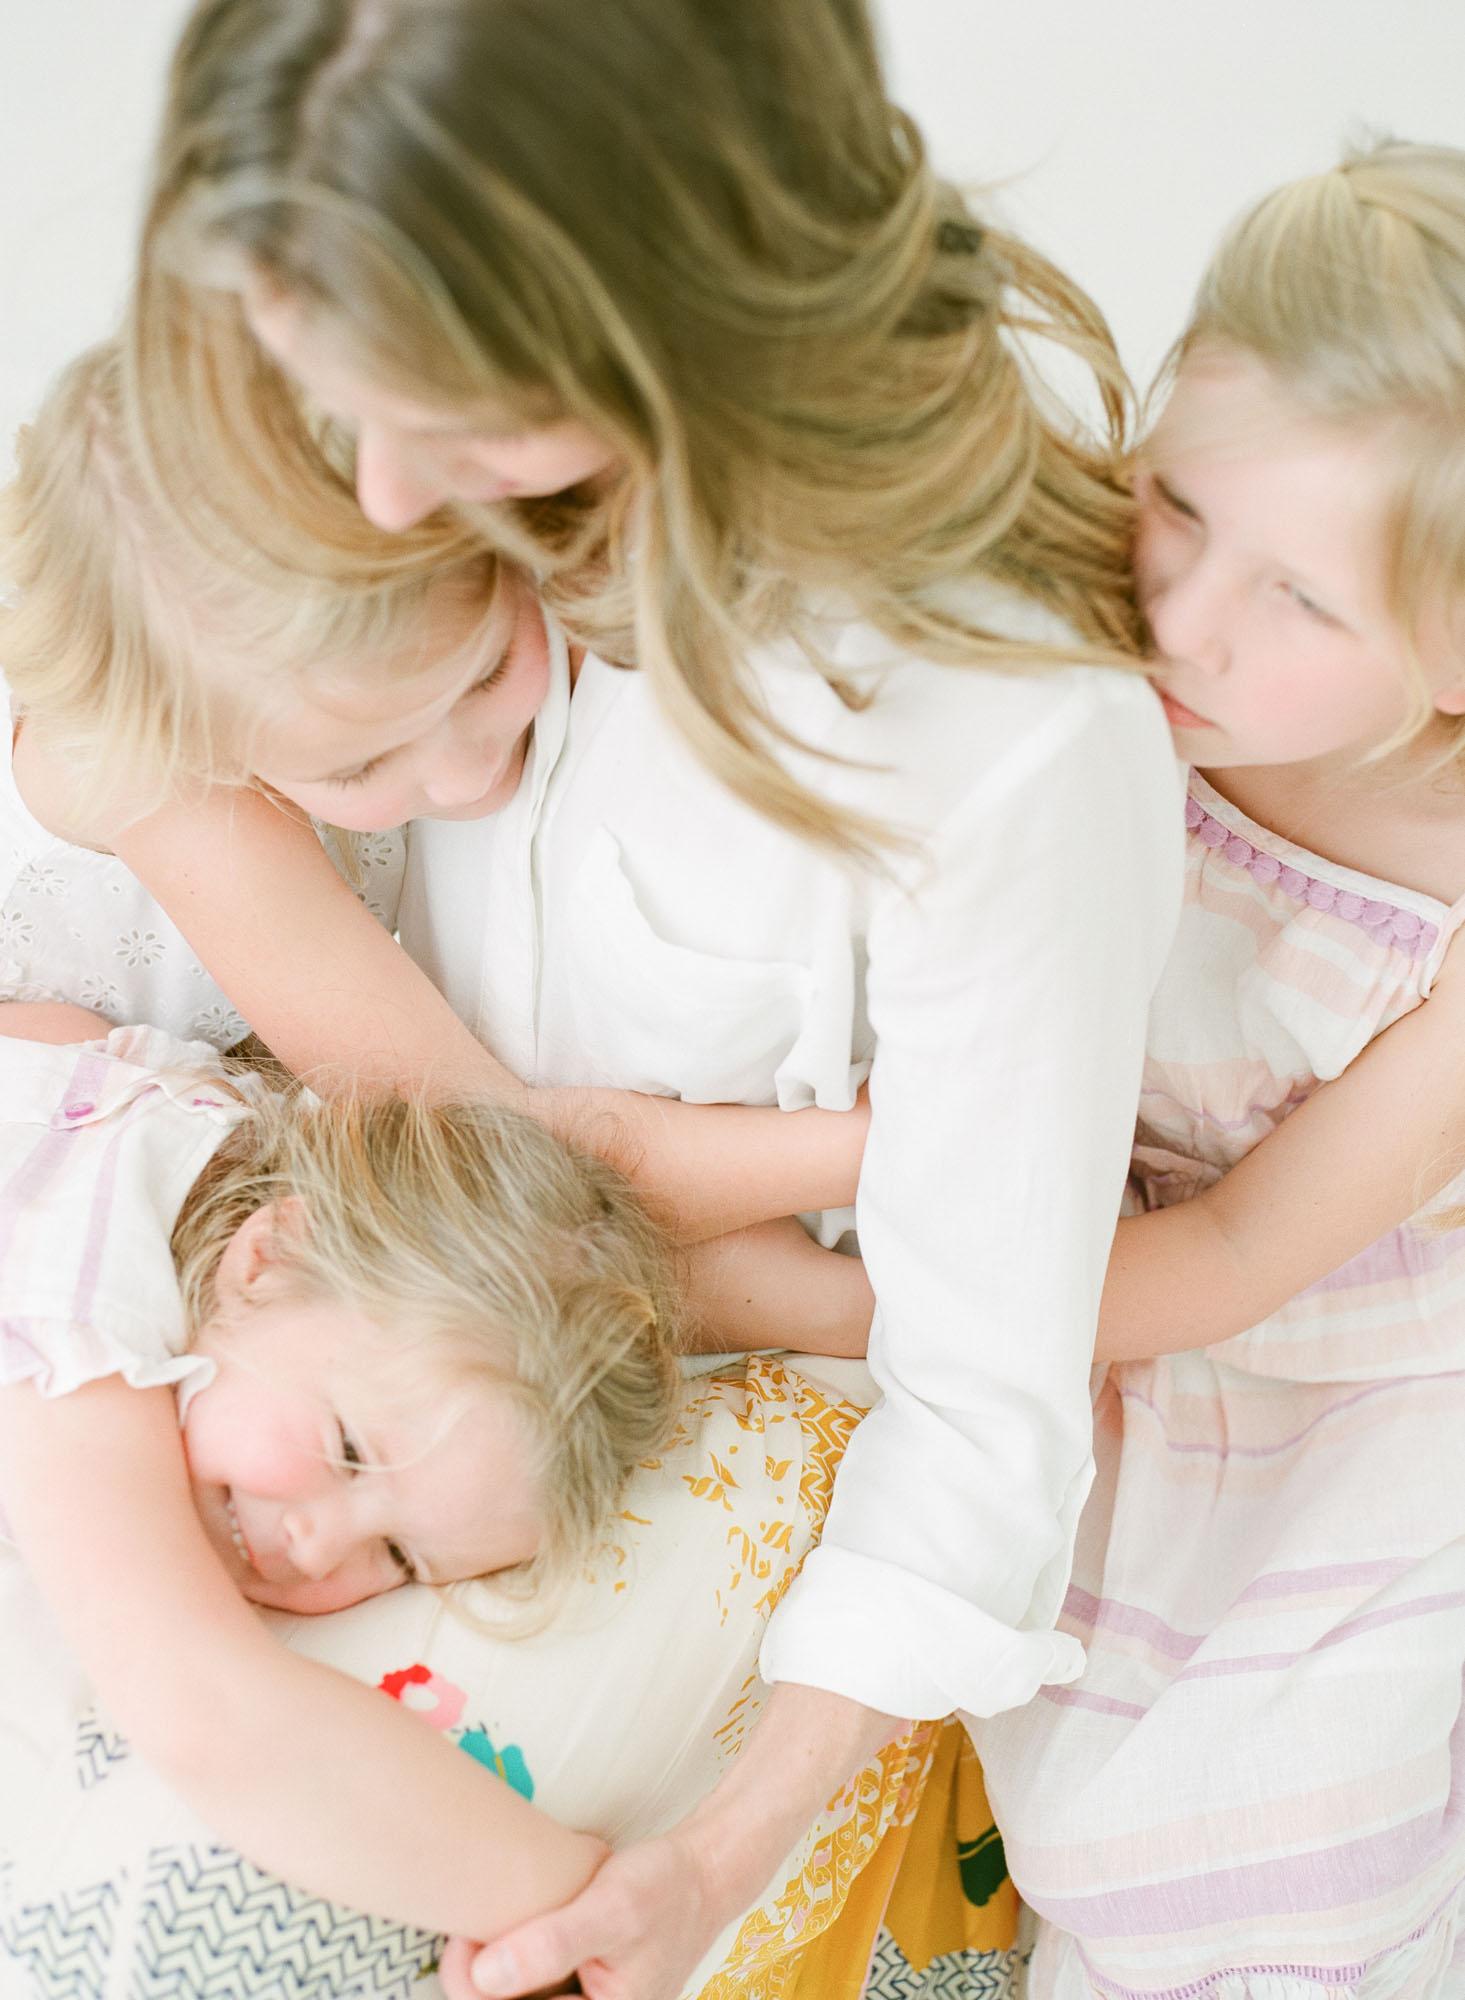 family-photographer-wake-forest-nc-motherhood-studio-portraits-001